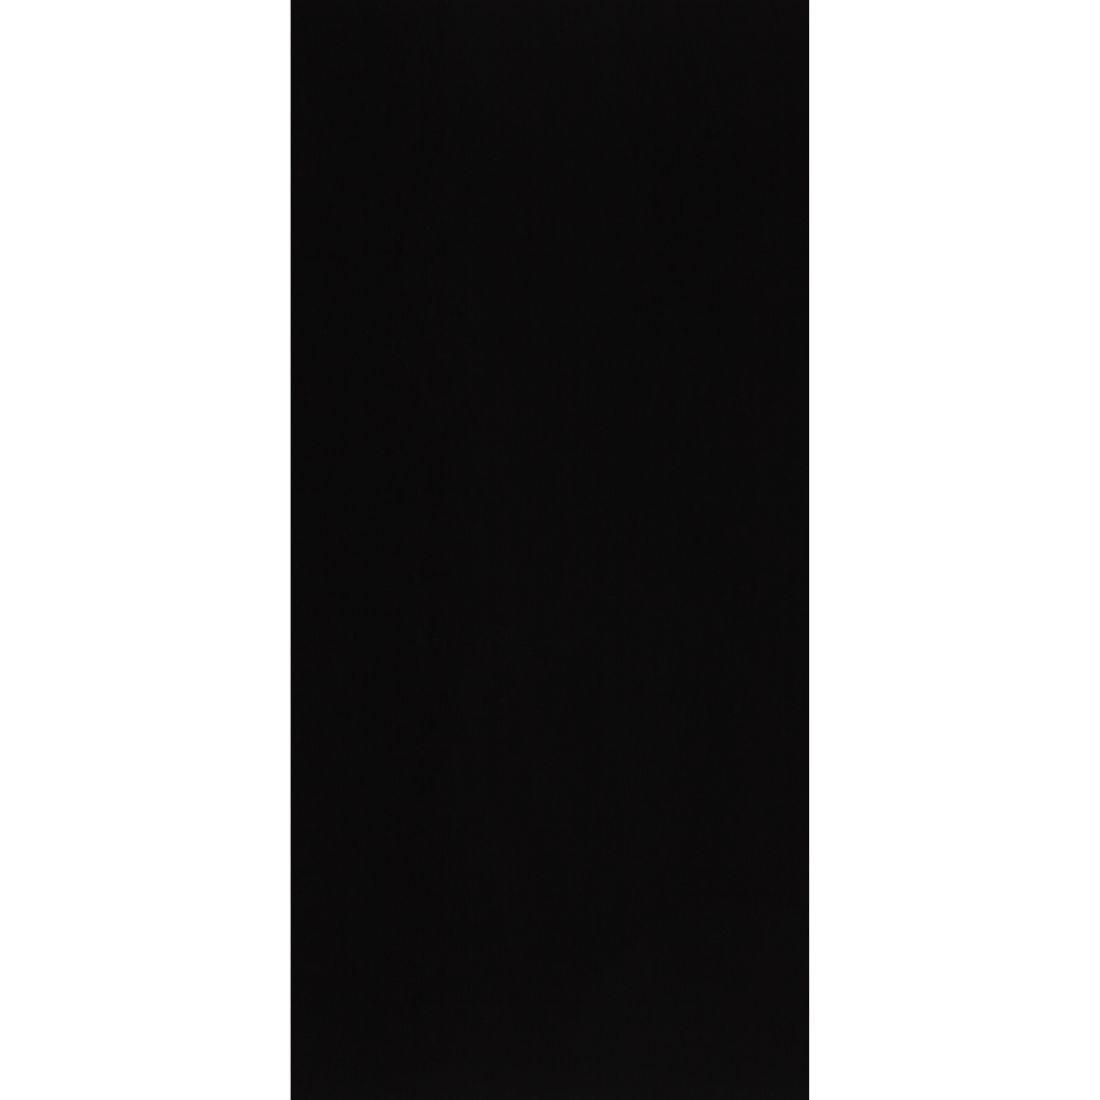 Specialty Wall Lining Panel Noir Kiss 2700 x 1200 x 4.5mm